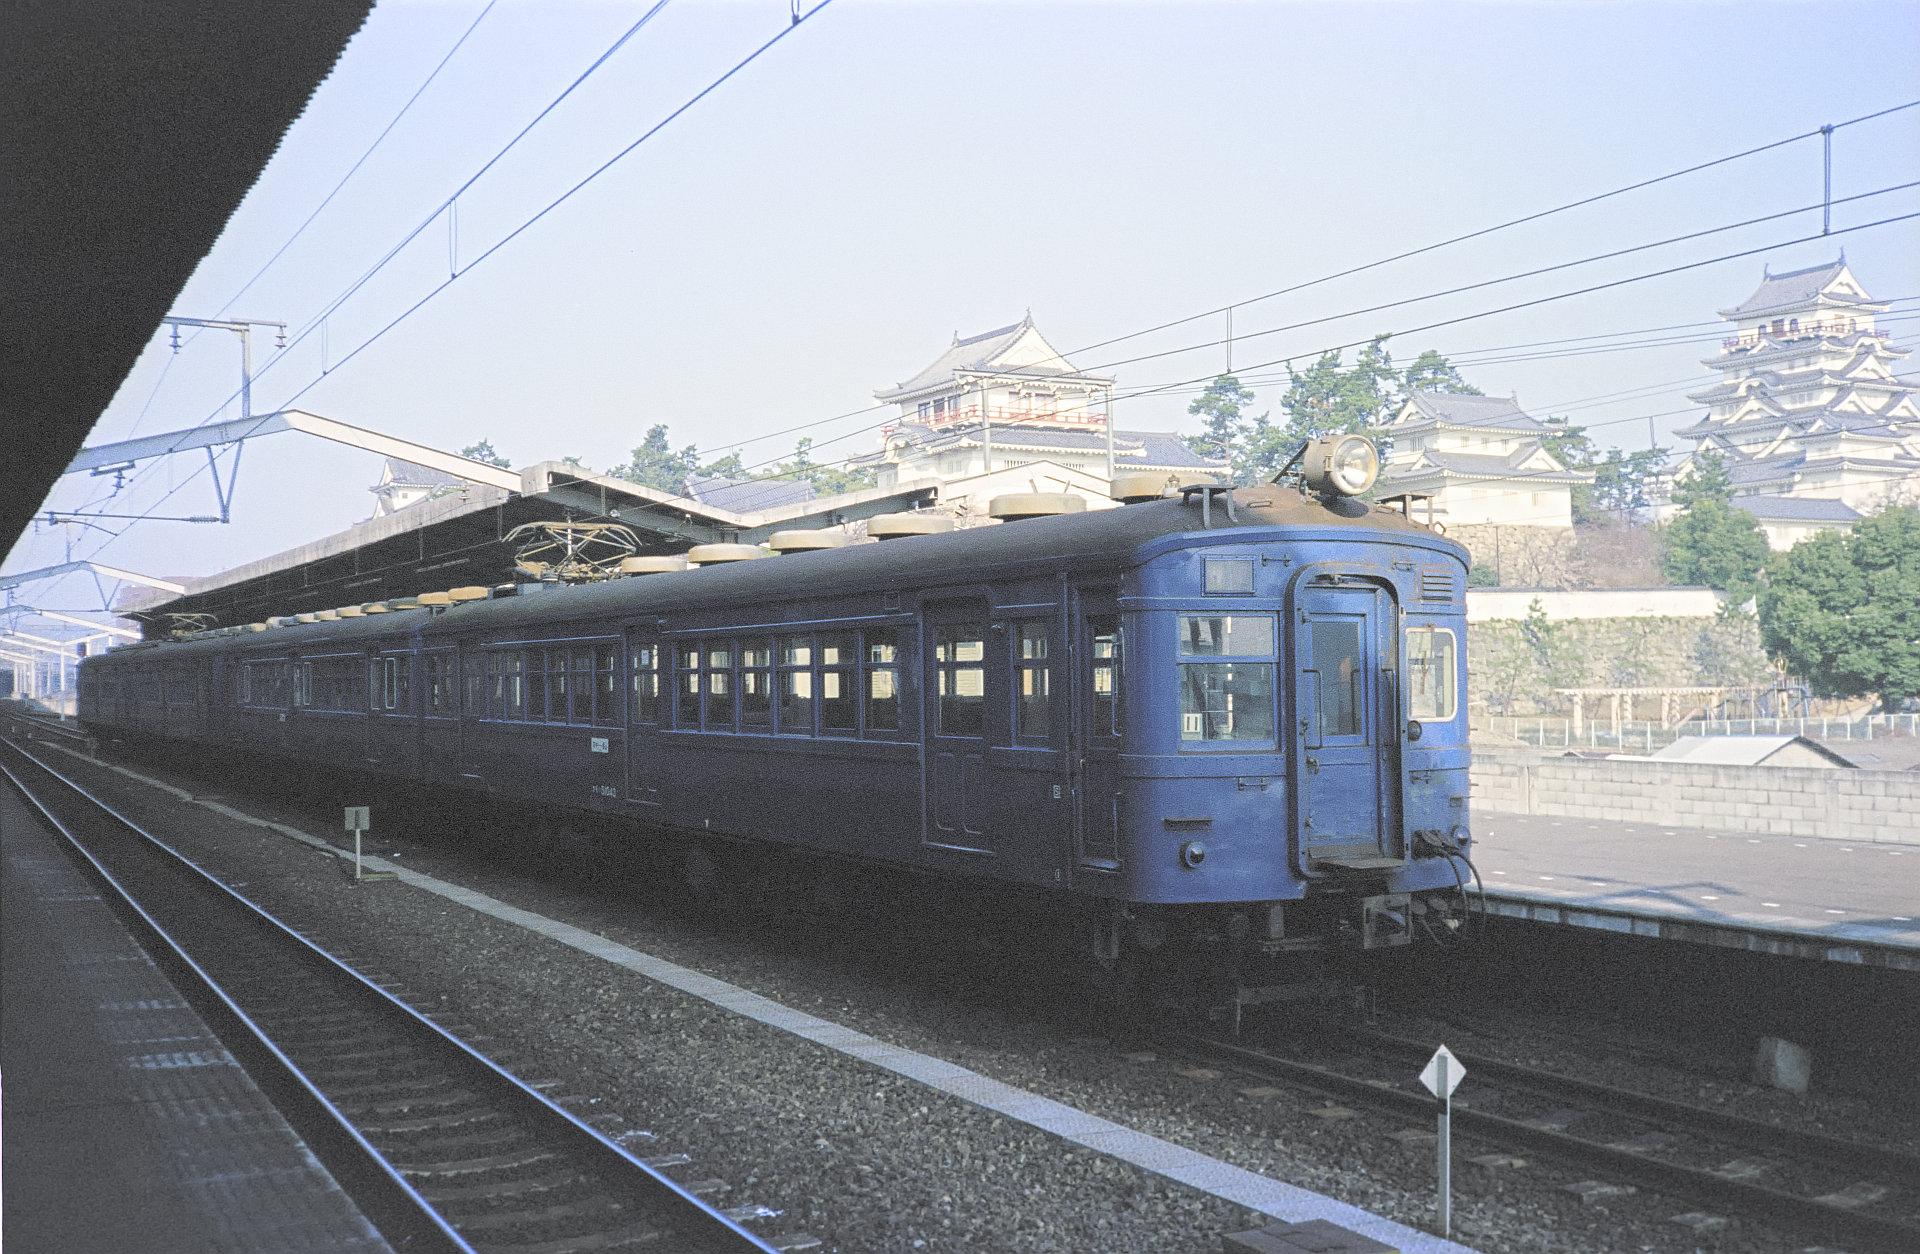 f:id:yasuo_ssi:20210211211149j:plain